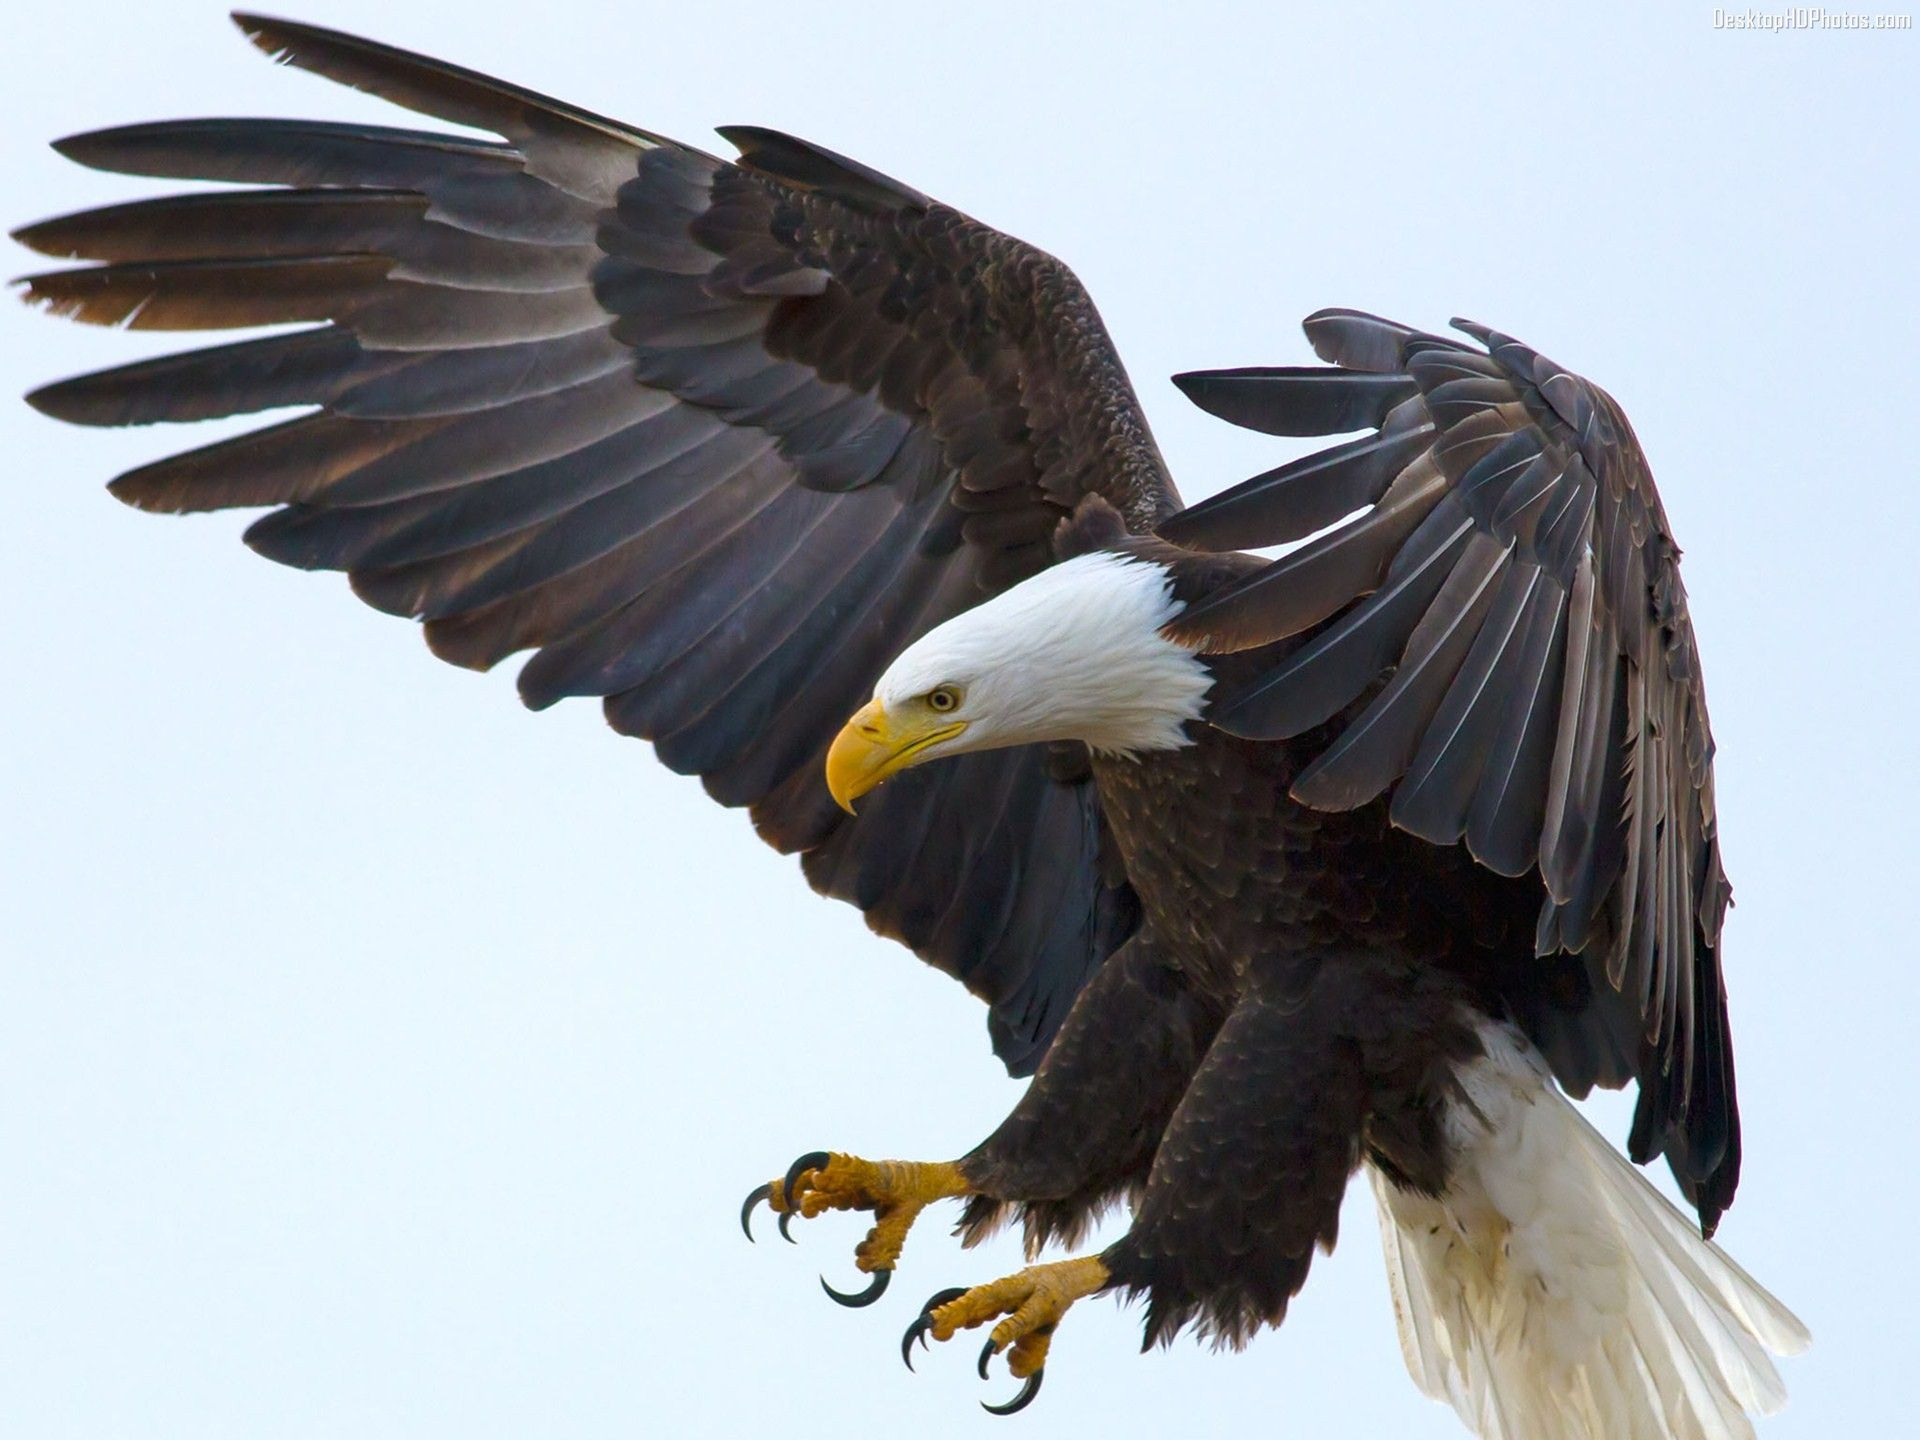 White Headed Bald Eagle 4k Ultra Hd Wallpaper Eagle Wallpaper Bald Eagle Pet Birds